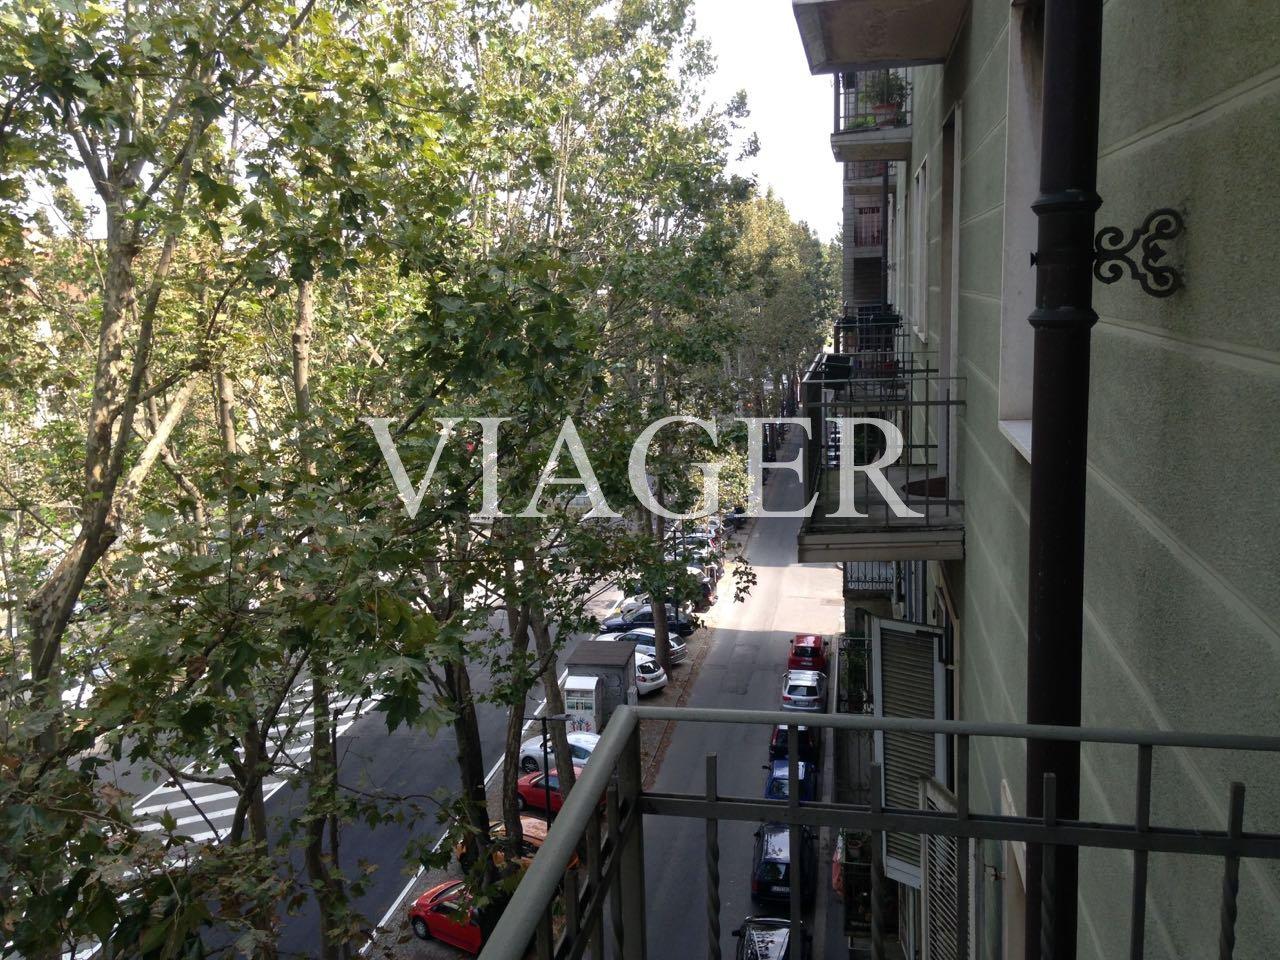 http://www.viager.it/public/Viager-1471-13568_g.jpg